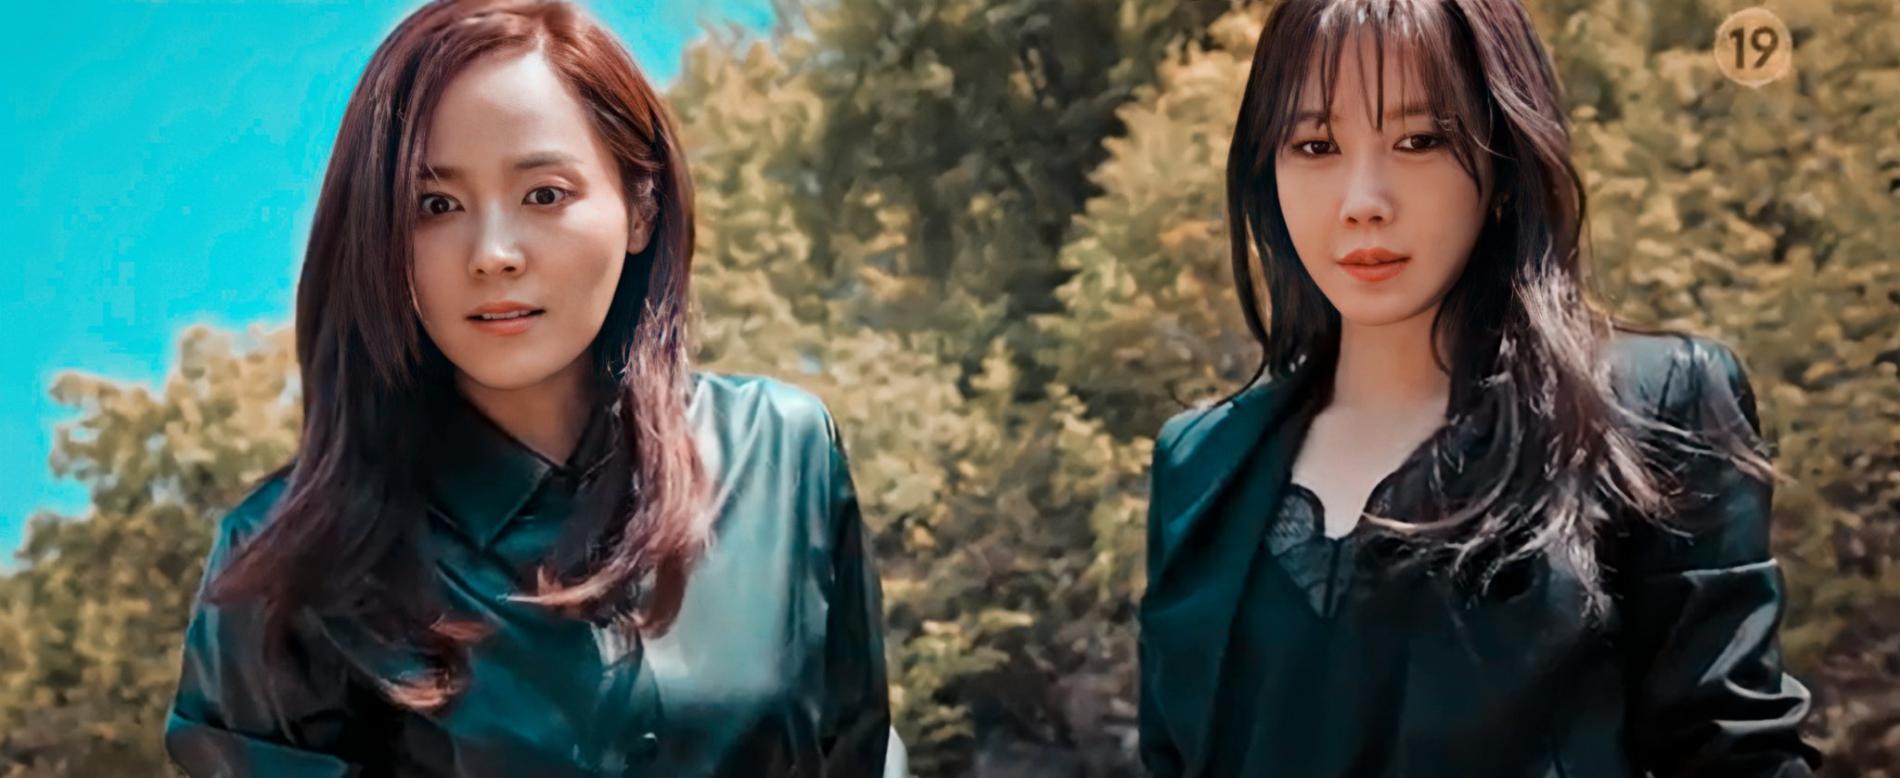 Nonton Drama Korea The Penthouse 3 Episode 1 Full Sub Indo, Hari Kebebasan